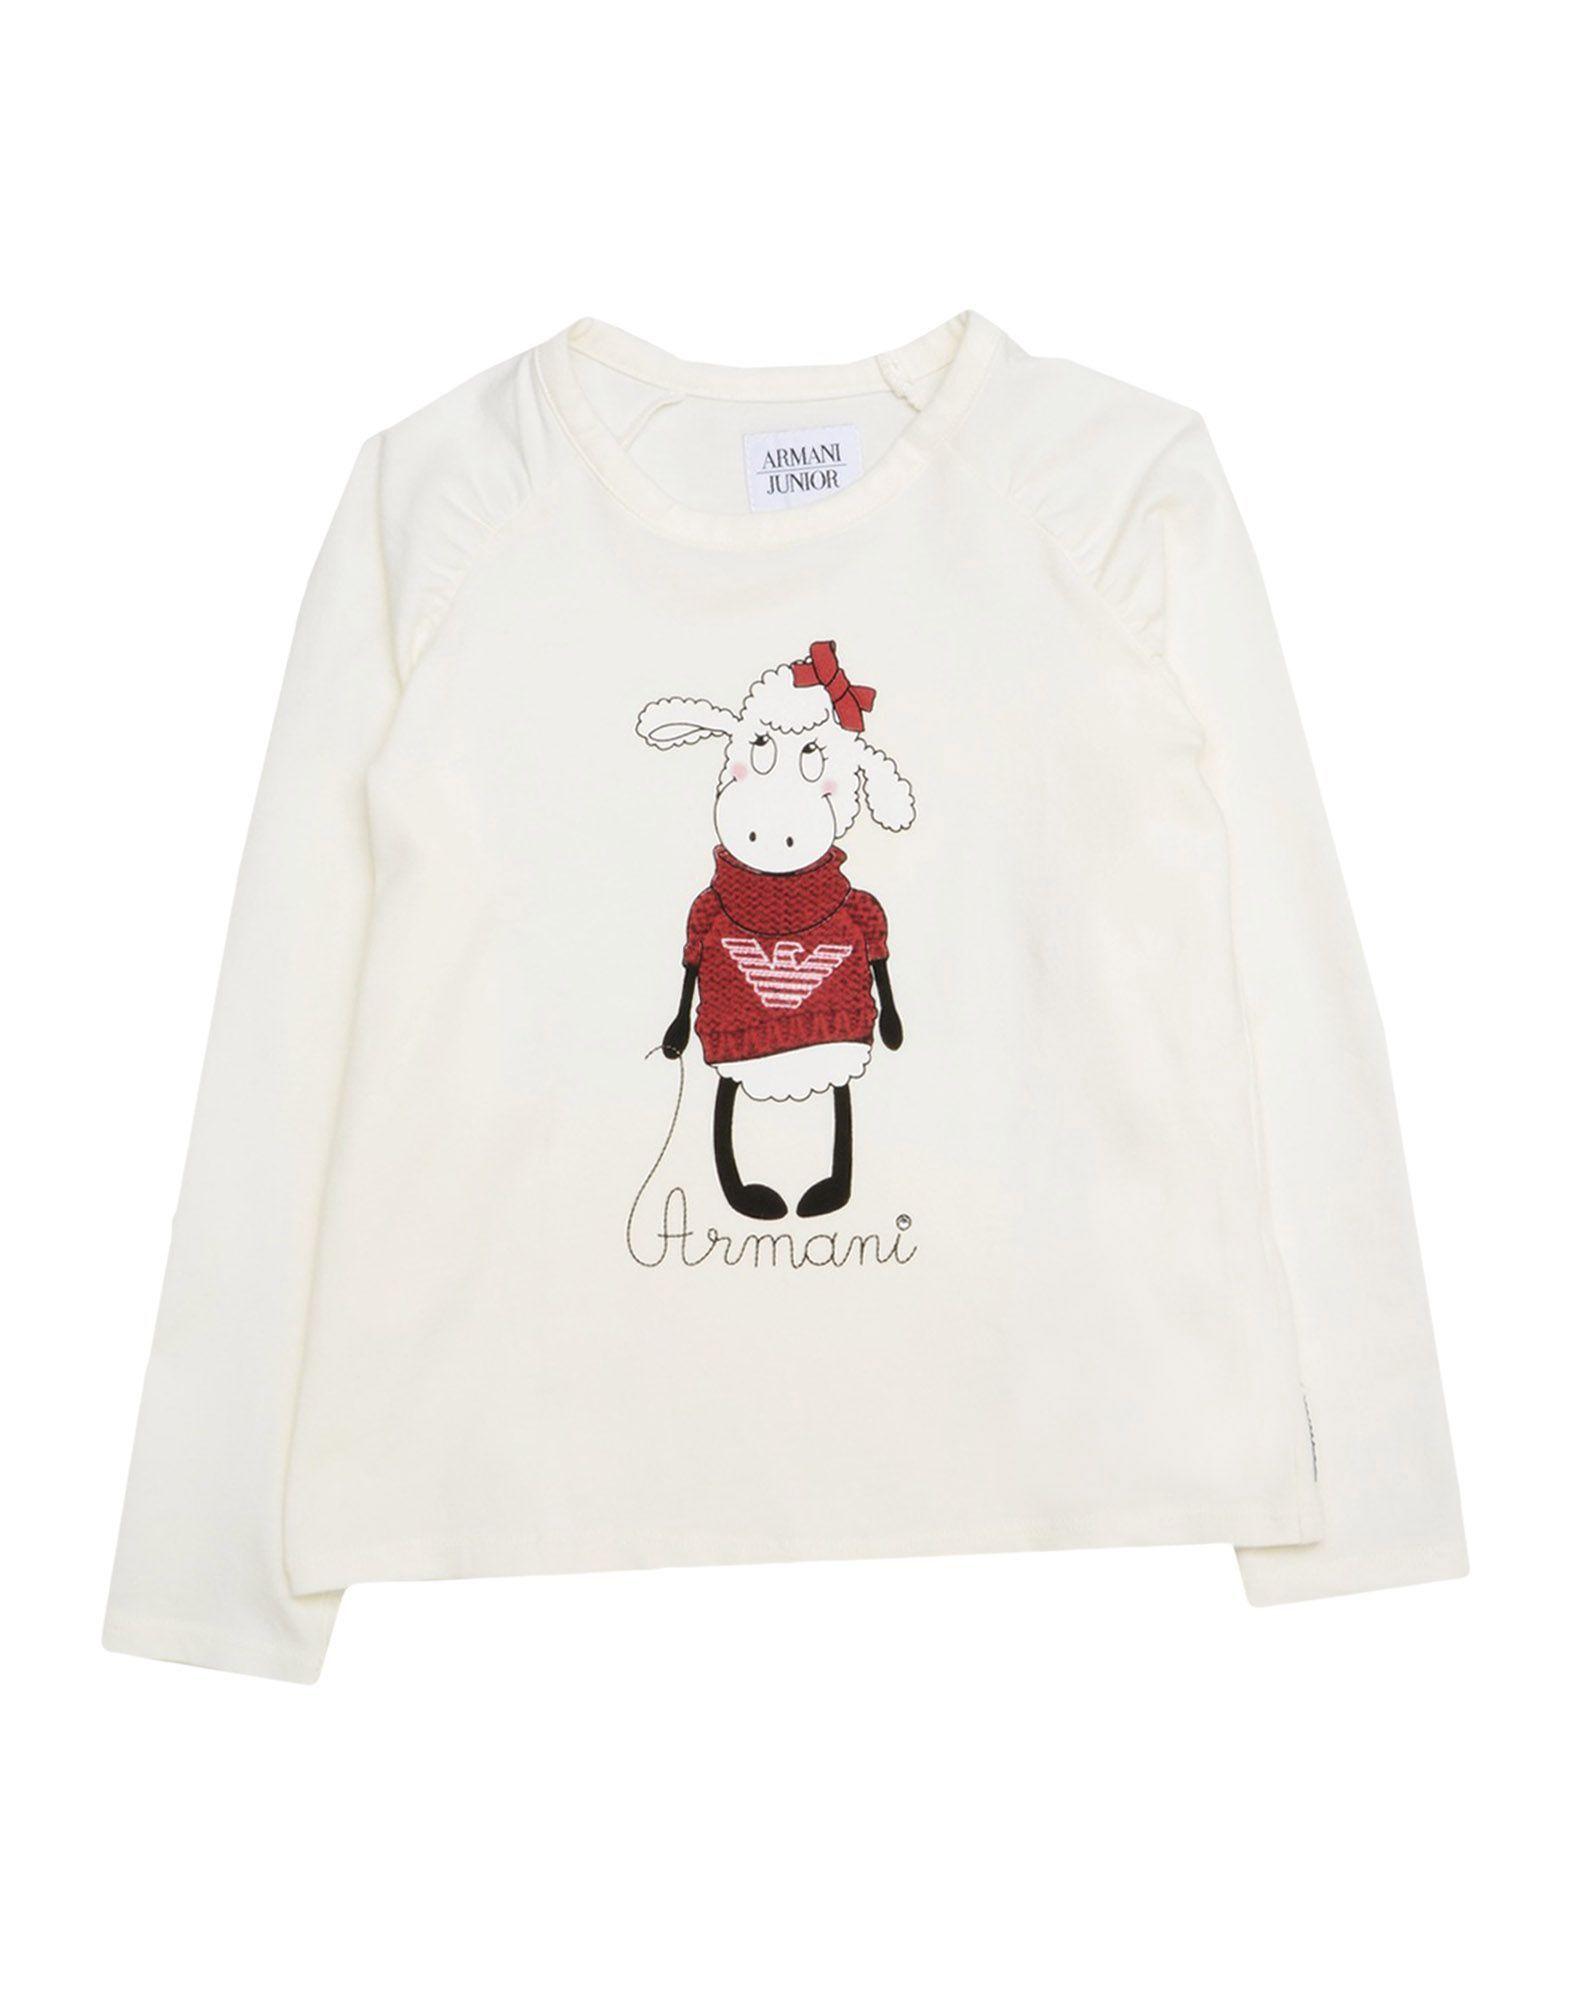 TOPWEAR Armani Junior Ivory Girl Cotton